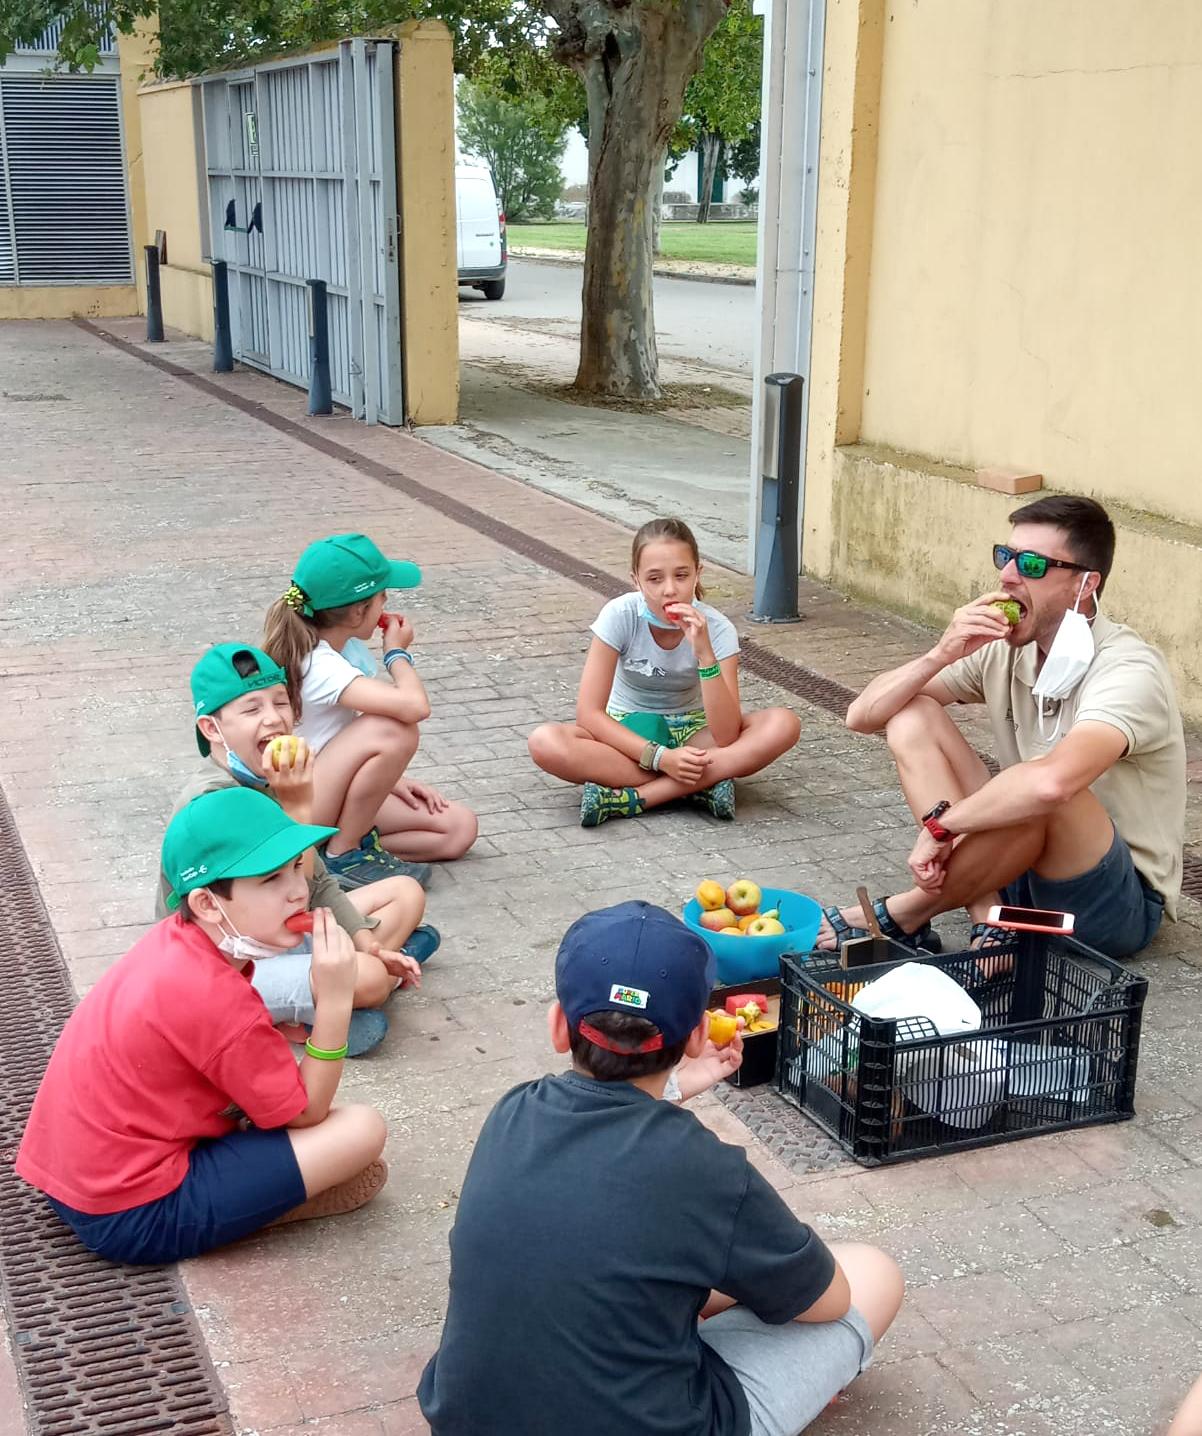 Mercazaragoza dona fruta de temporada al campus infantil de verano de La Alfranca.